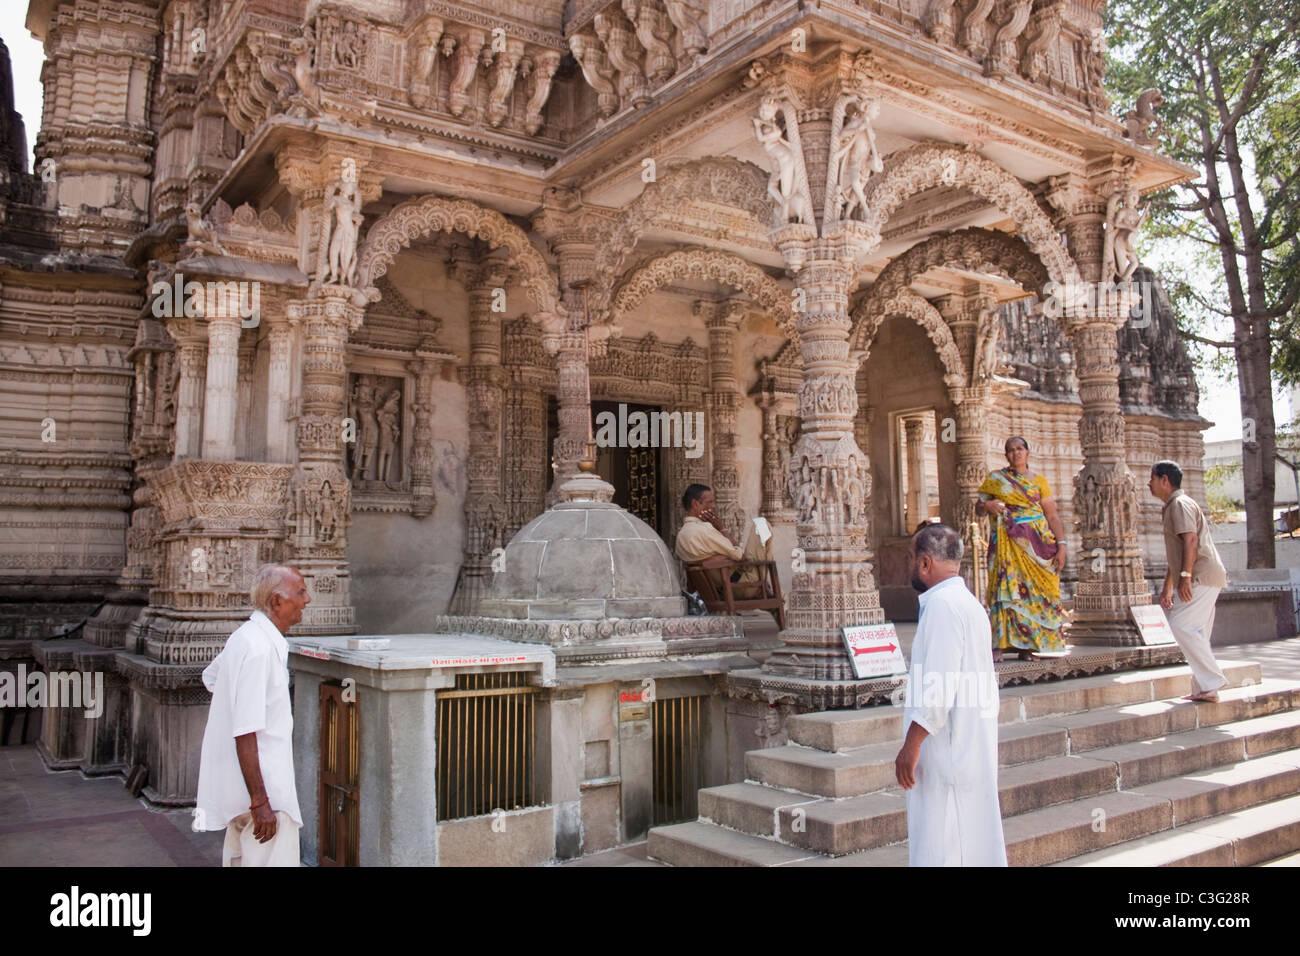 People at a temple, Swaminarayan Akshardham Temple, Ahmedabad, Gujarat, India - Stock Image